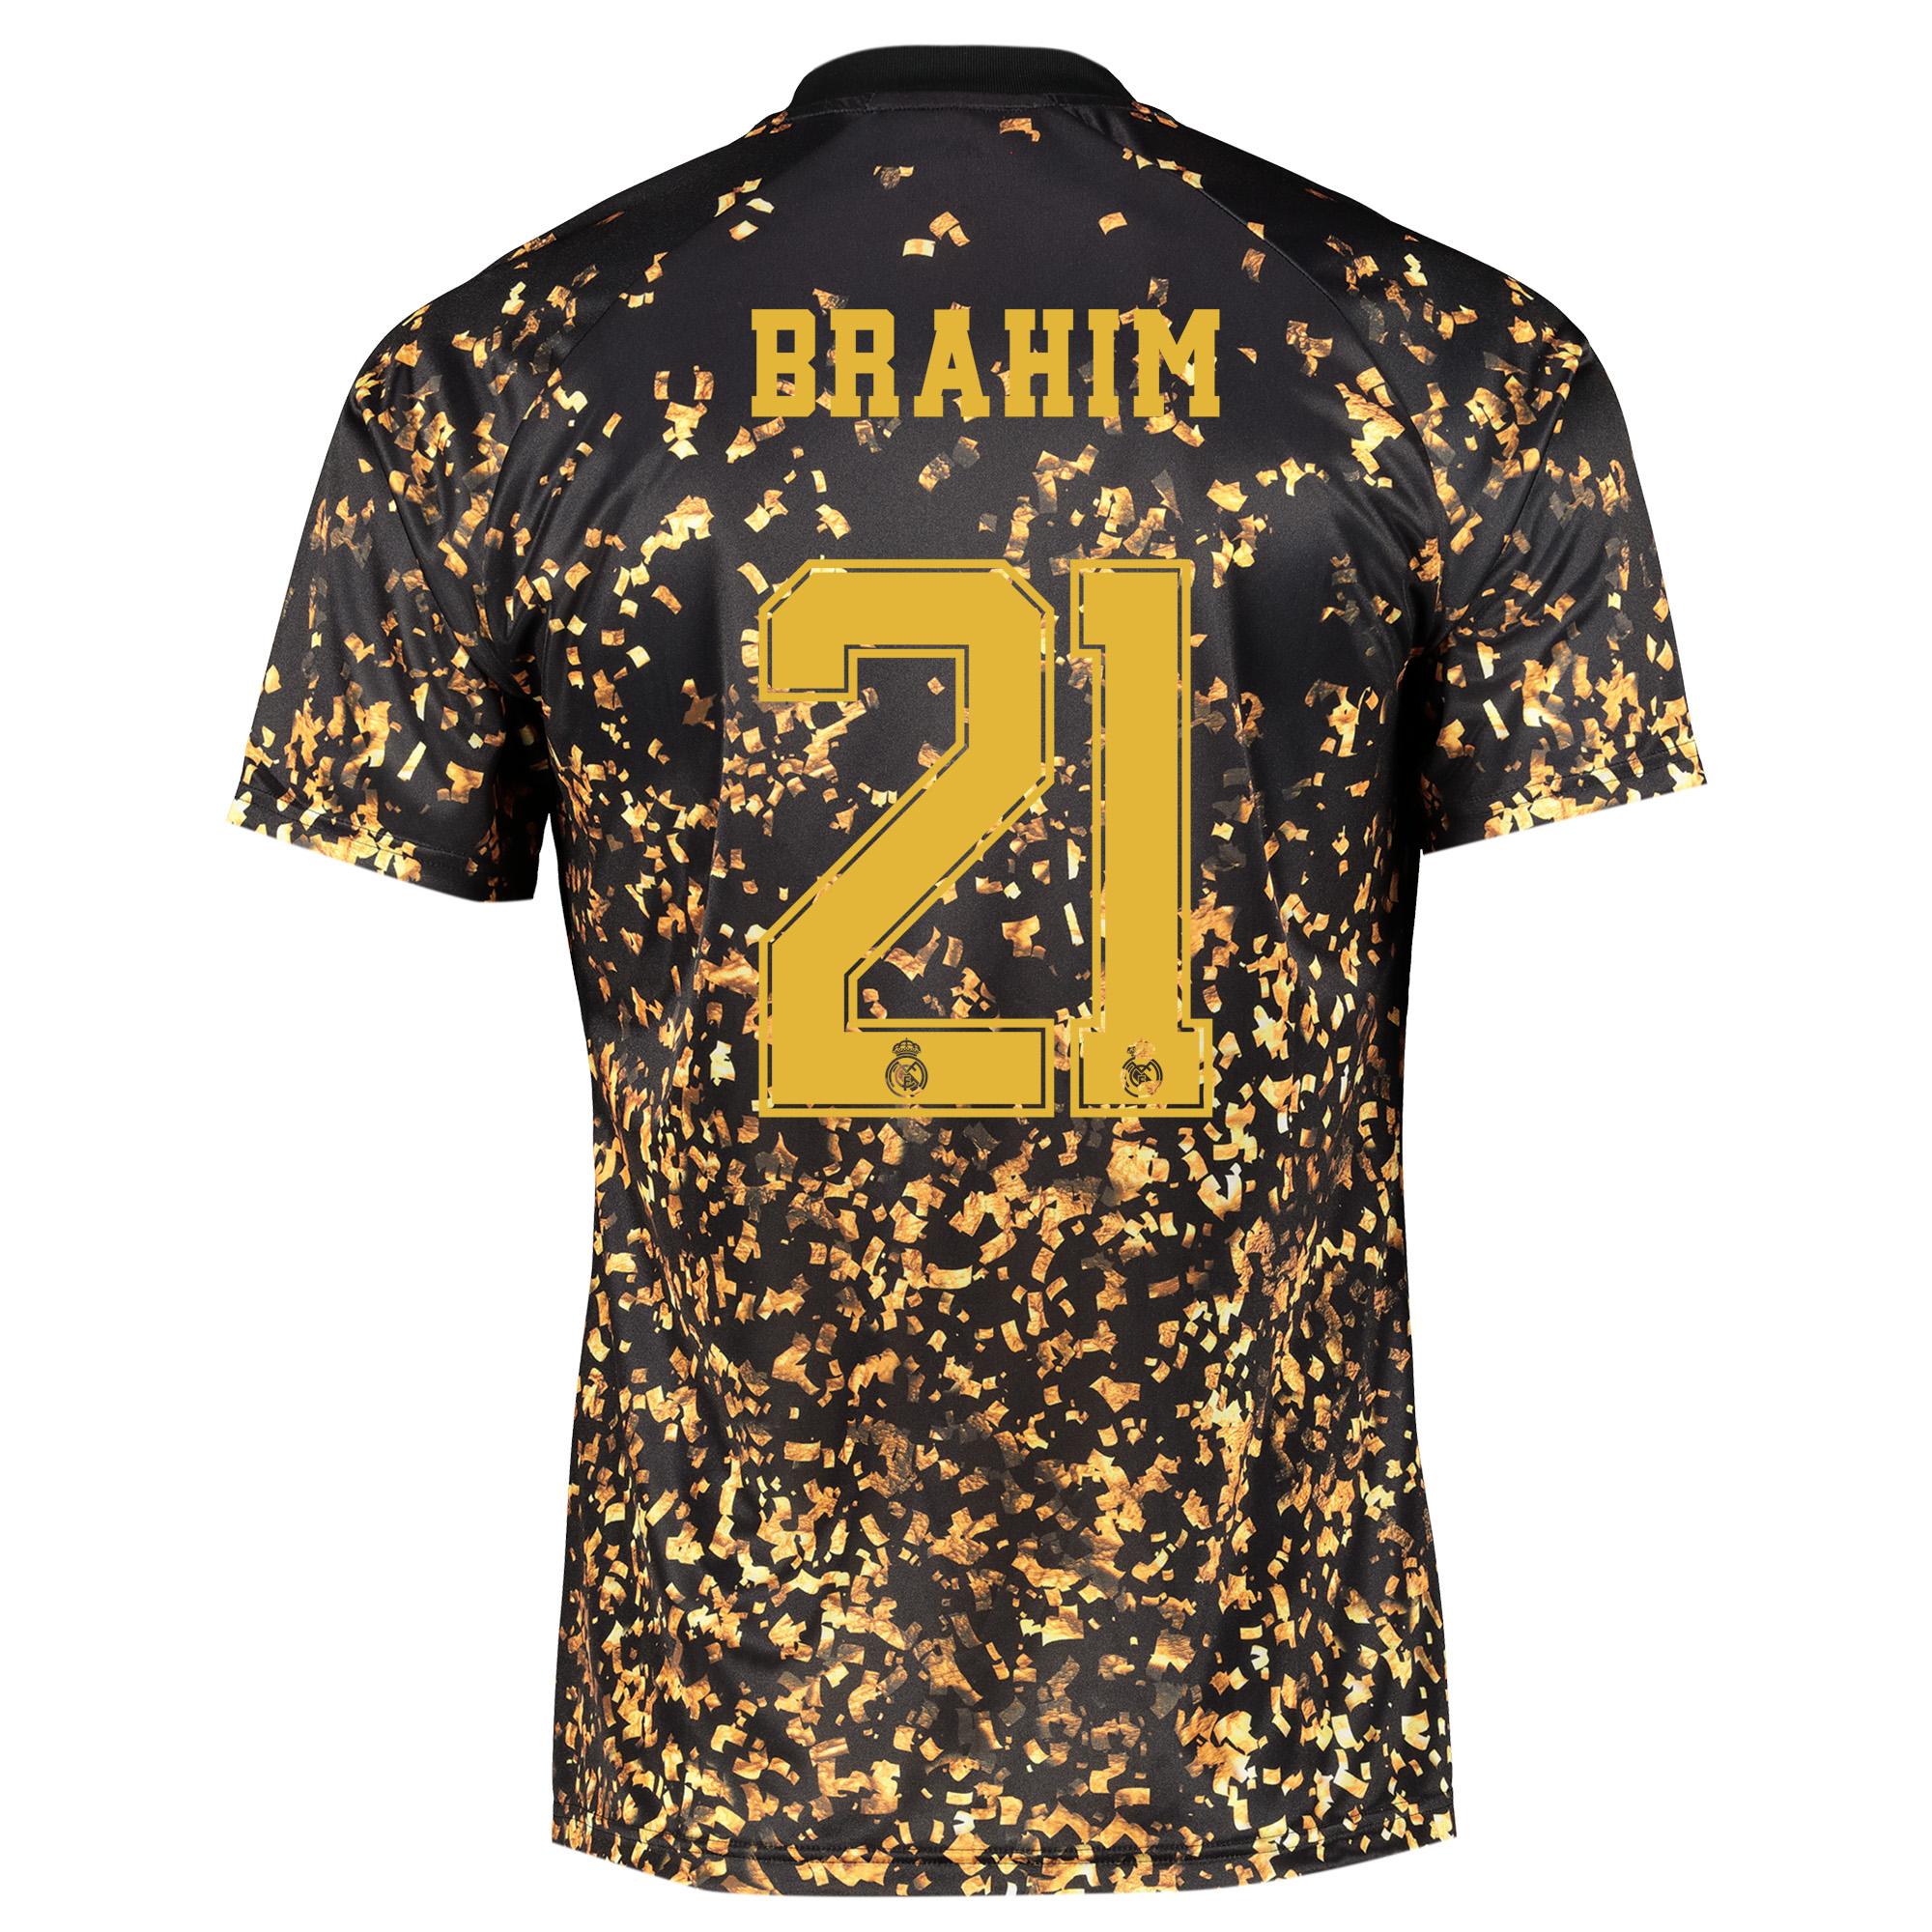 Camiseta adidas EA Sports del Real Madrid - Negro dorsal Brahim 21